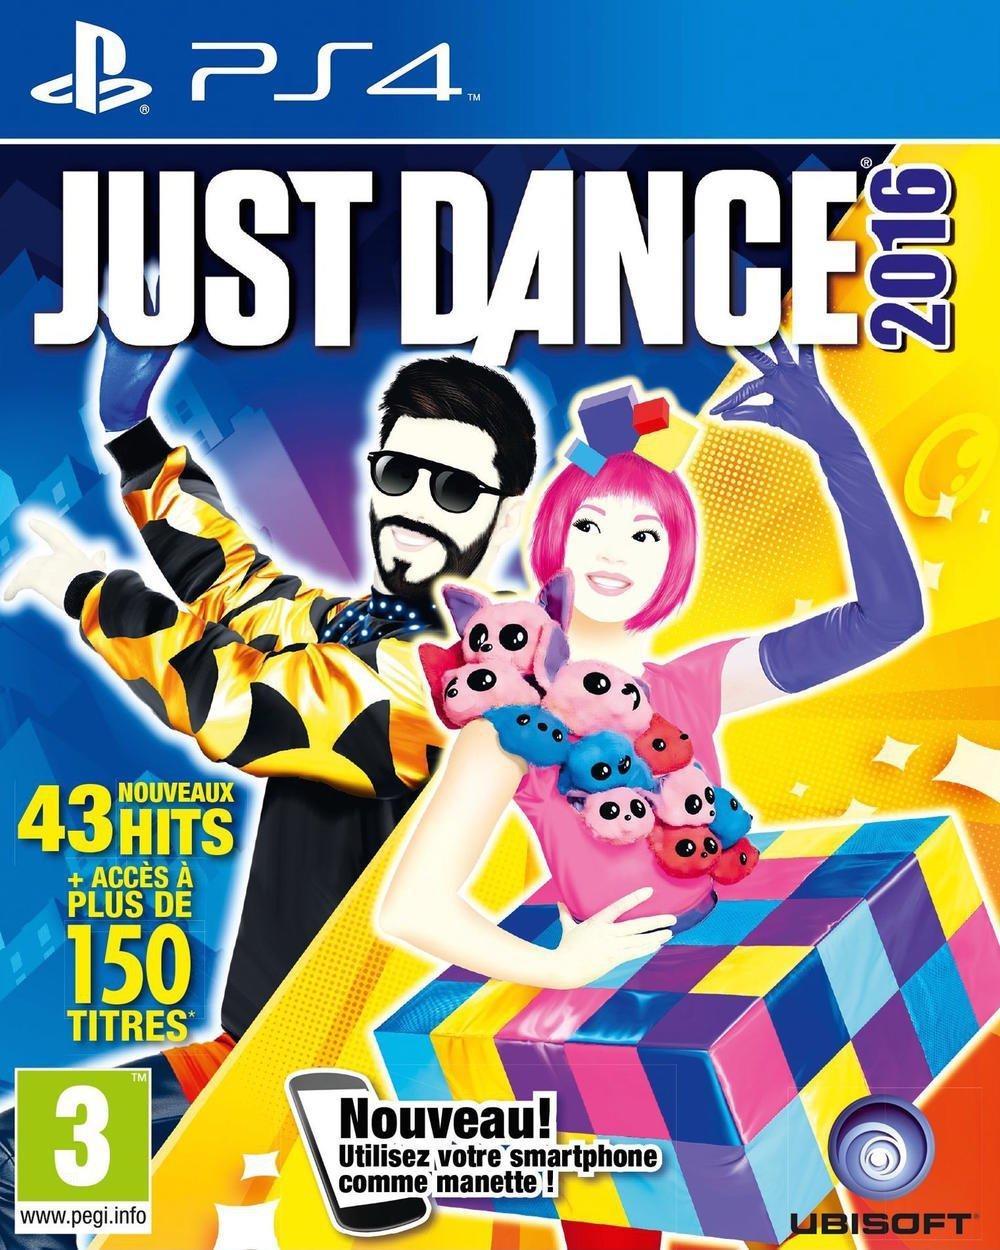 Just Dance 2016 sur Ps4, , Wii U, Xbox 360,Wii, XboxOne ou Ps3